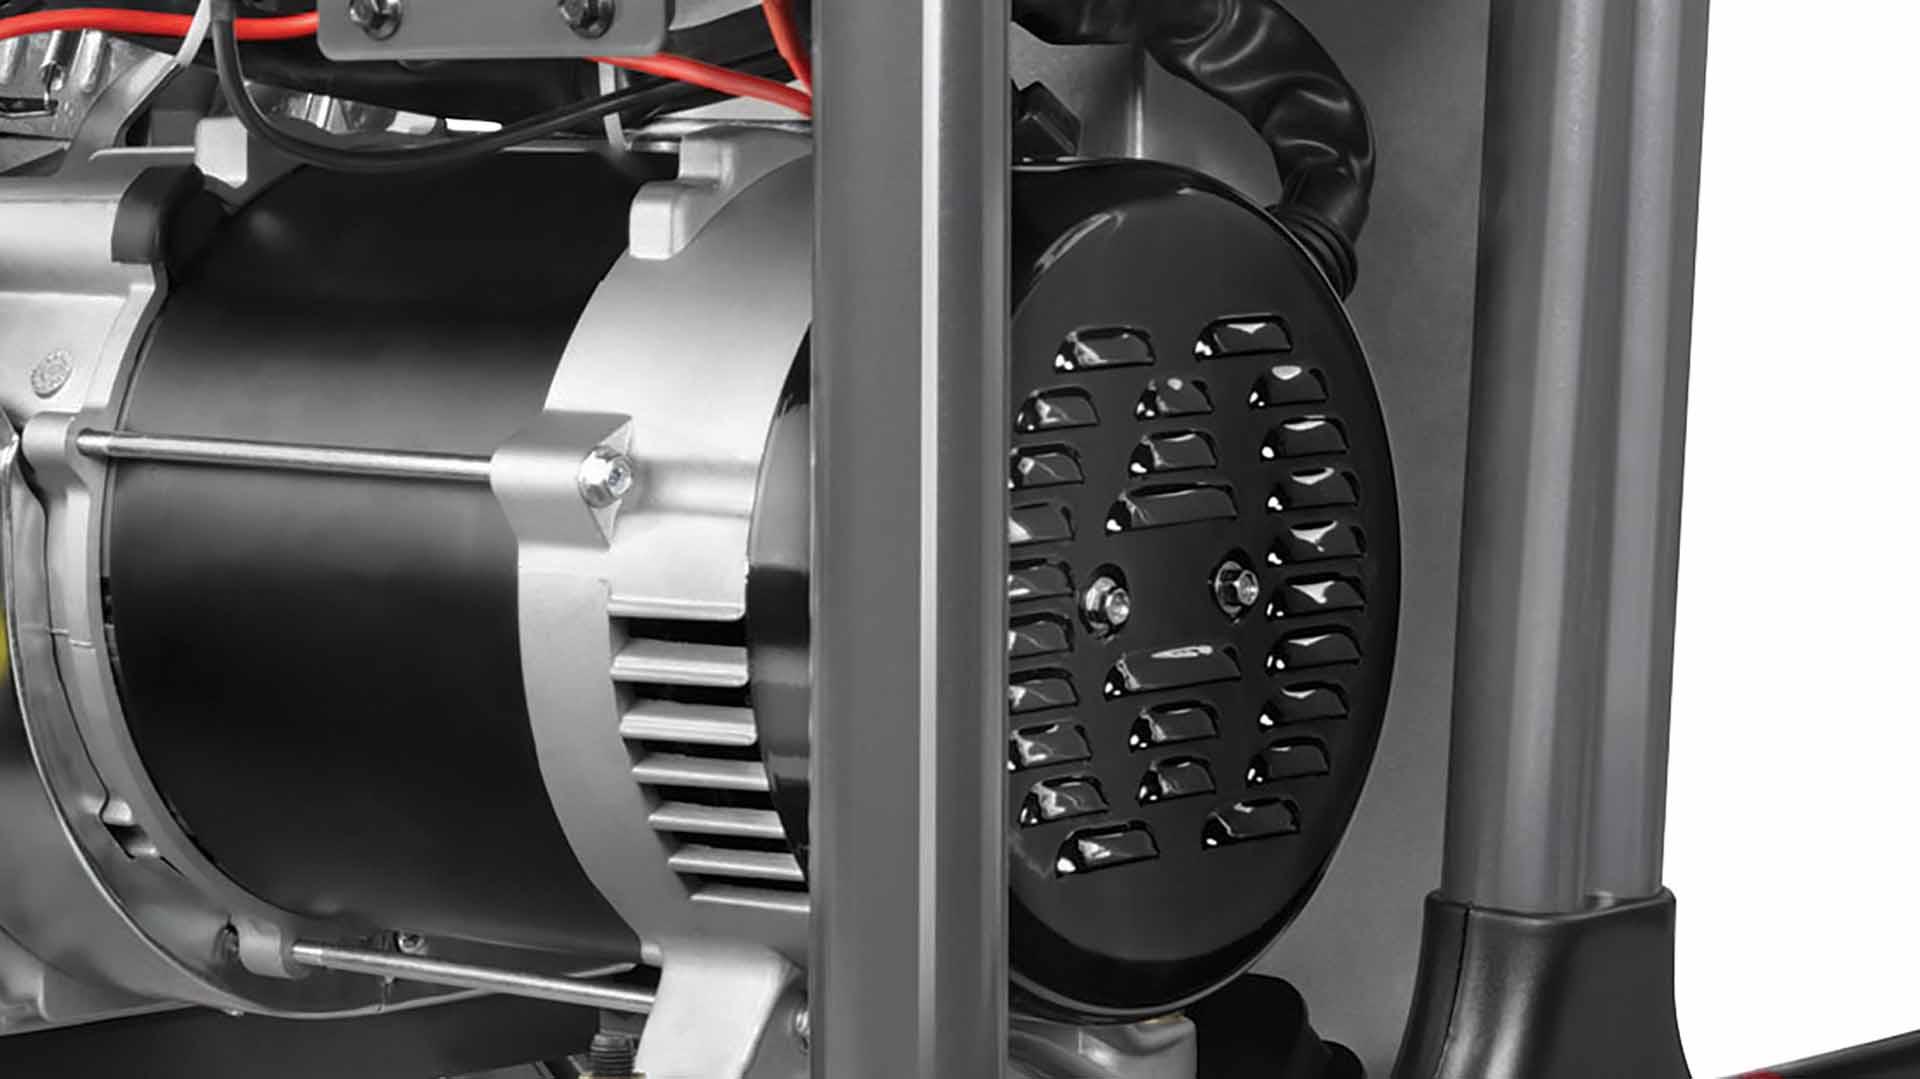 6250 Watt Portable Generator Centurion 5500 Wiring Diagram Power Surge Alternator For Generators